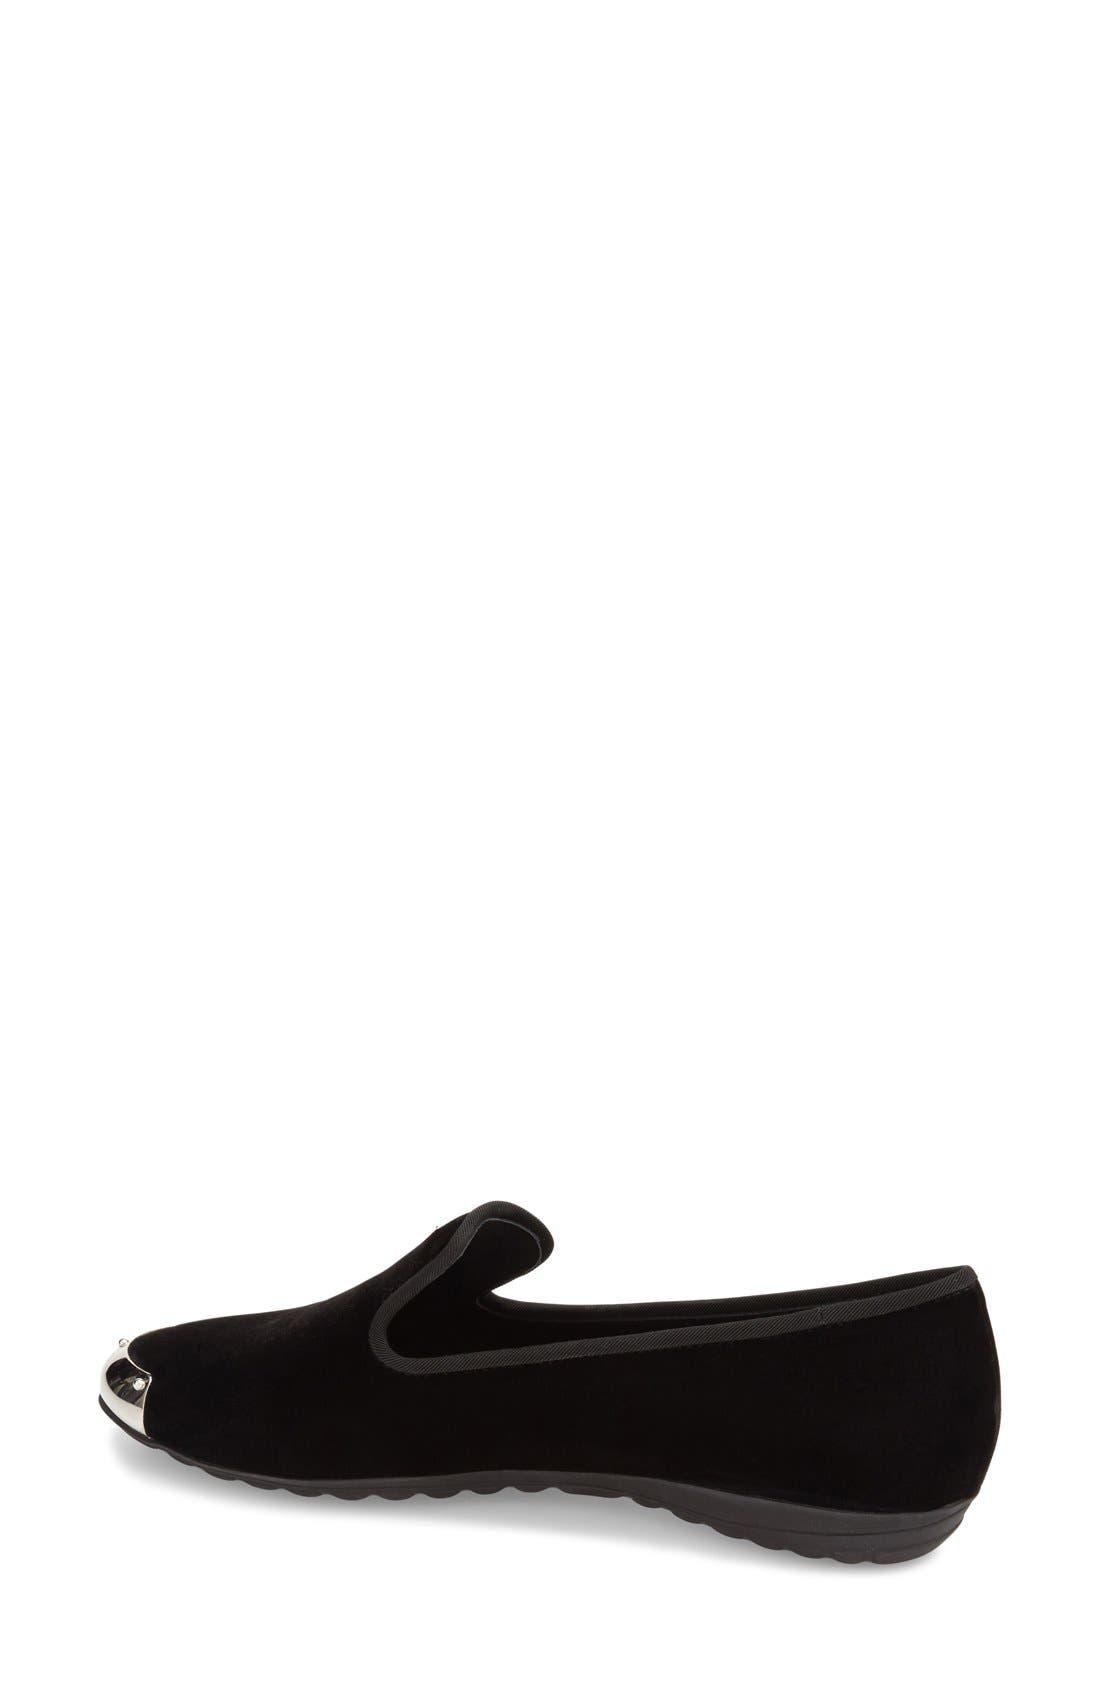 Alternate Image 2  - Giuseppe Zanotti 'Dalila' Metallic Toe Velour Loafer (Women) (Nordstrom Exclusive)